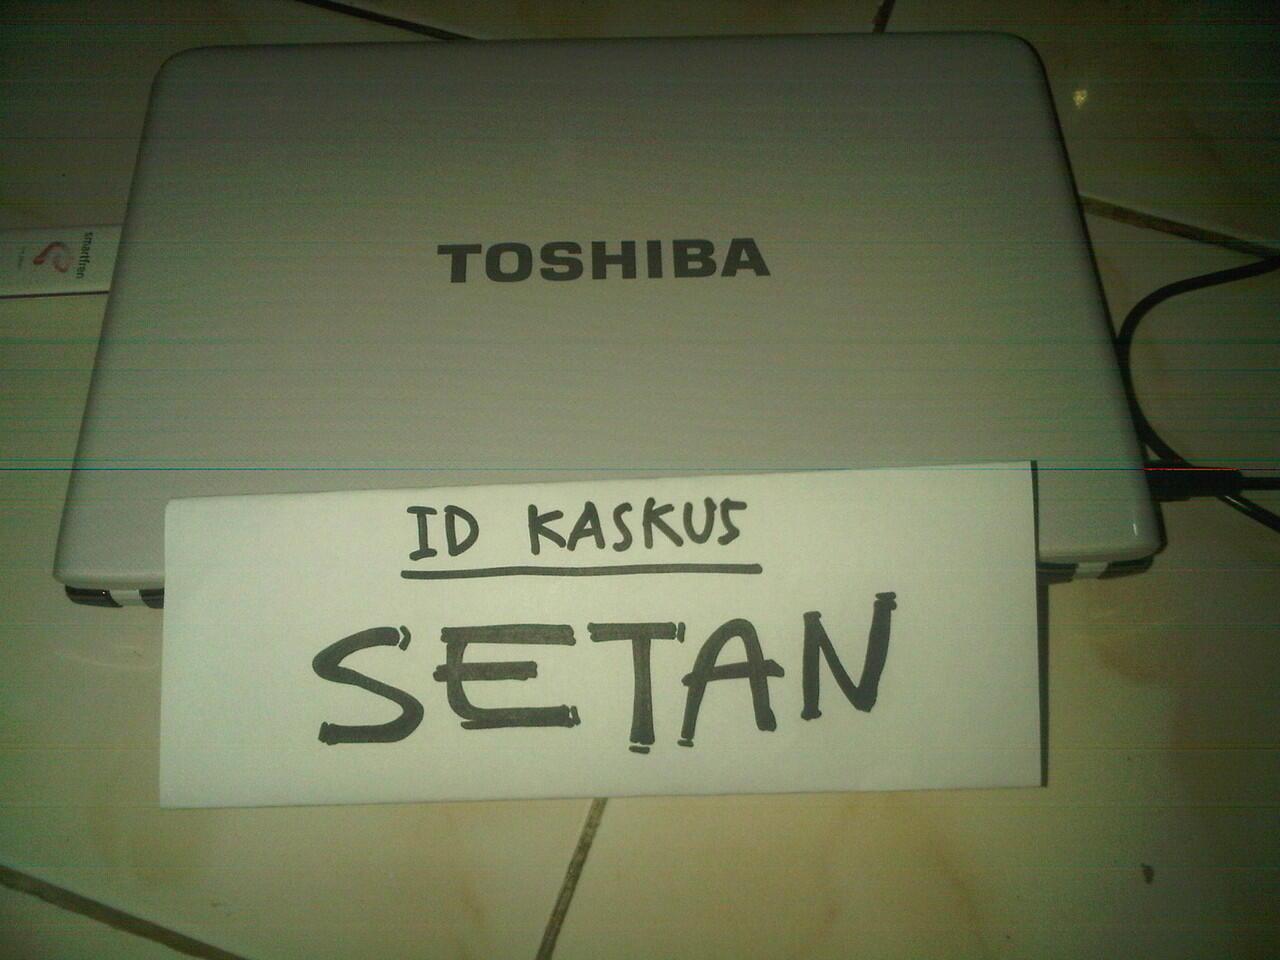 JUAL CEPAT TOSHIBA PORTEGE T210 CORE i3 .RAM 2GB HDD 500GB . BARANG SIMPANAN ISTIMEWA